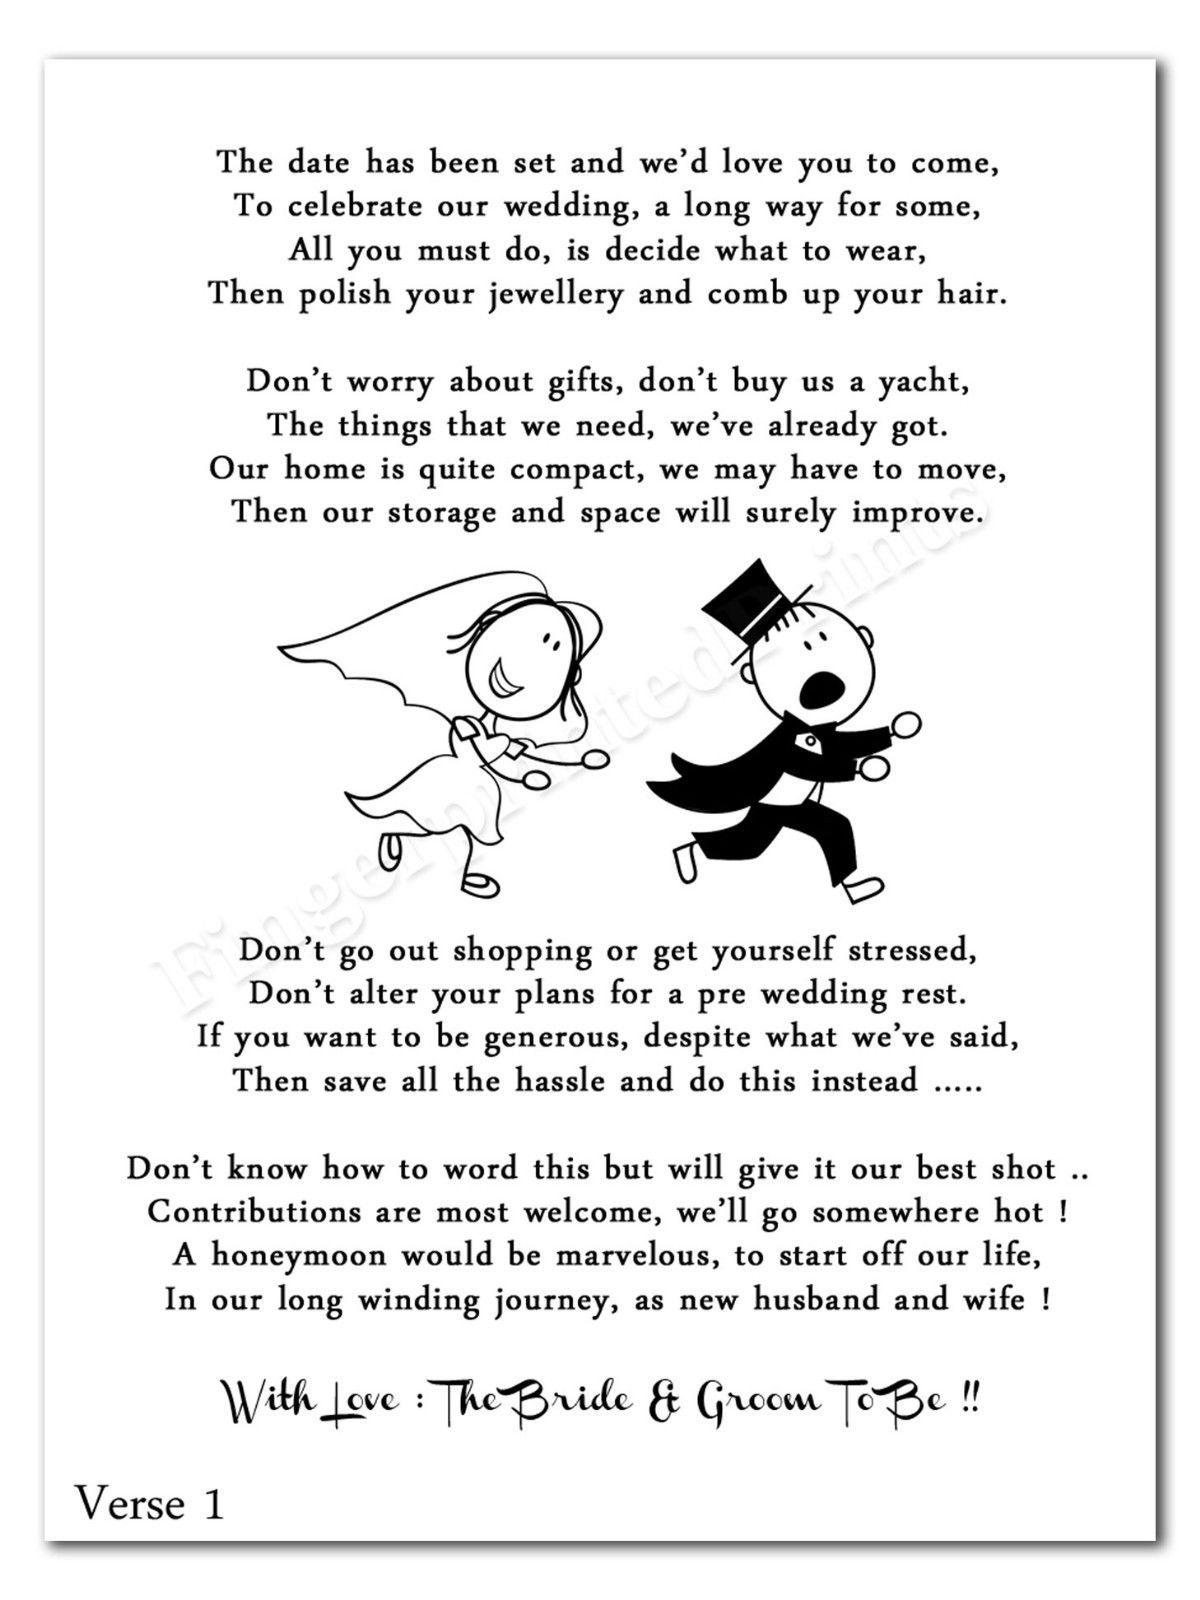 Wedding Cash Money Voucher Request Poems For Invites Cheap Funny Rg2 Design Funny Wedding Invitations Wedding Poems Wedding Gift Money